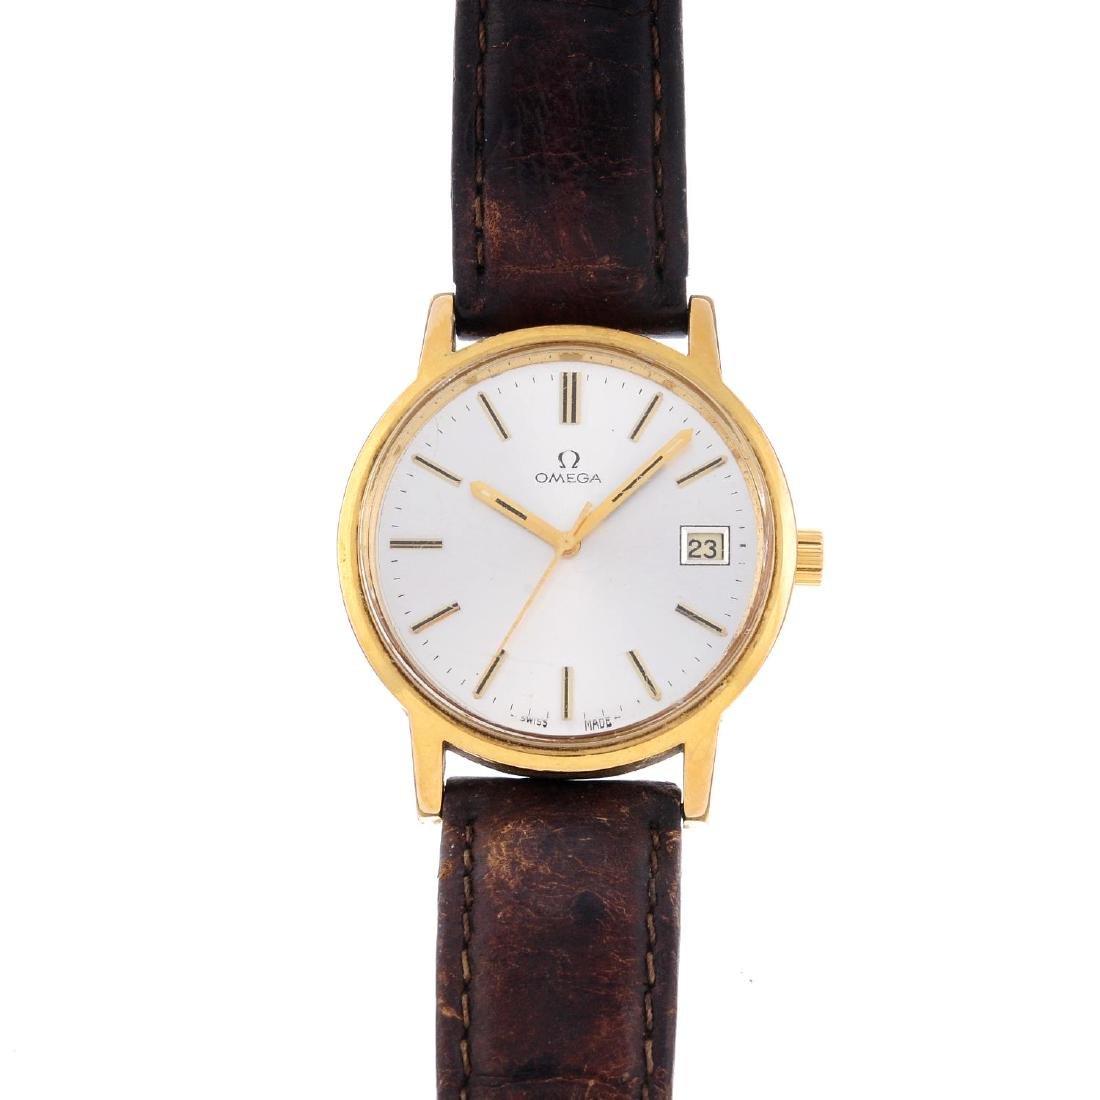 OMEGA - a gentleman's wrist watch. Gold plated case